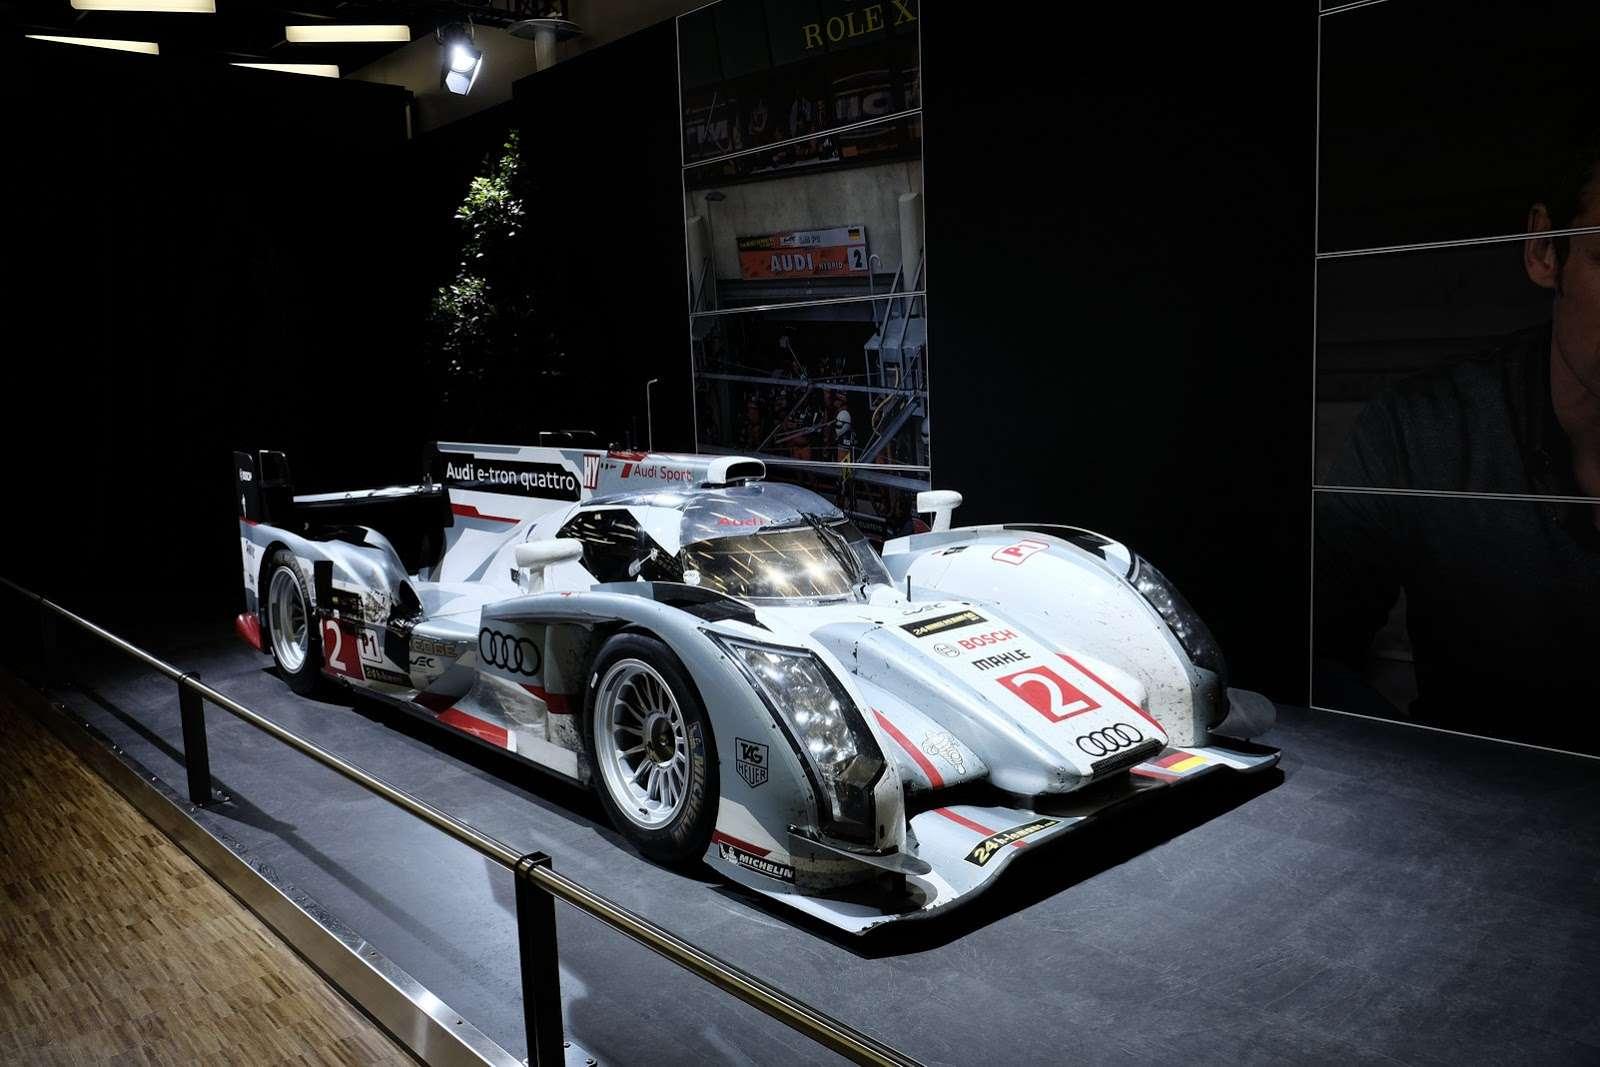 Audi Le Mans Geneva 2014